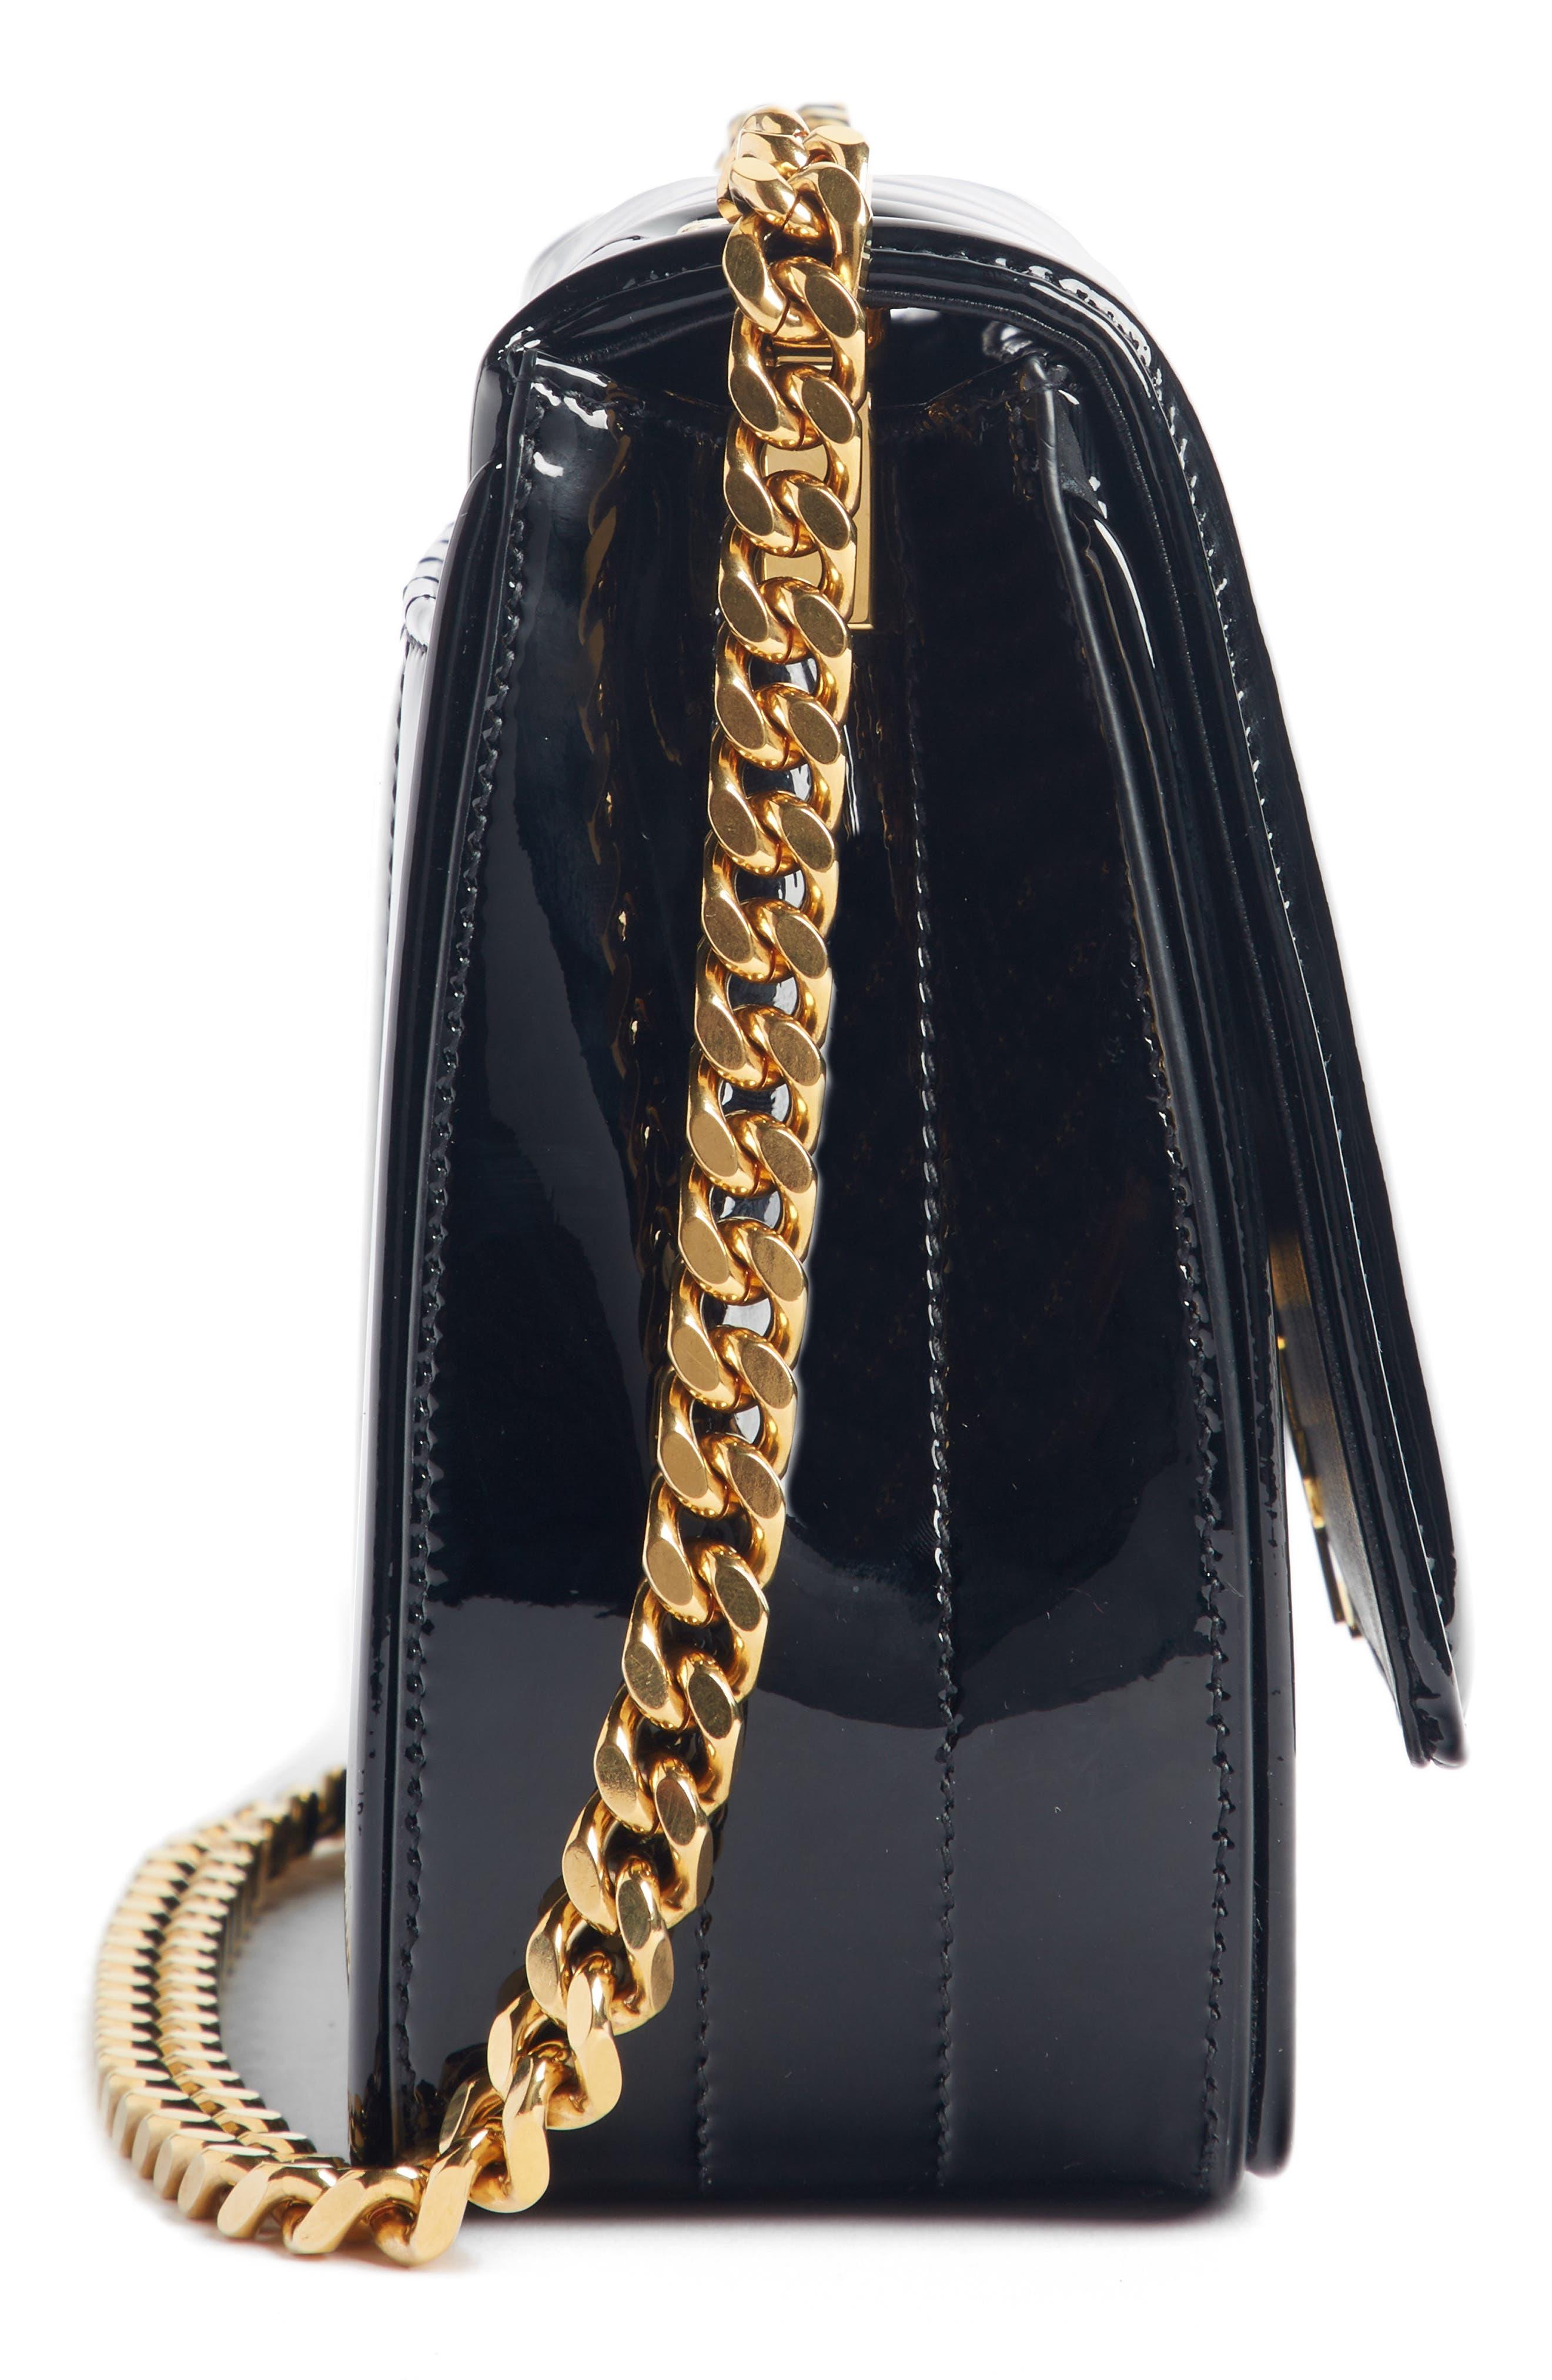 SAINT LAURENT, Small Vicky Patent Leather Crossbody Bag, Alternate thumbnail 3, color, NOIR